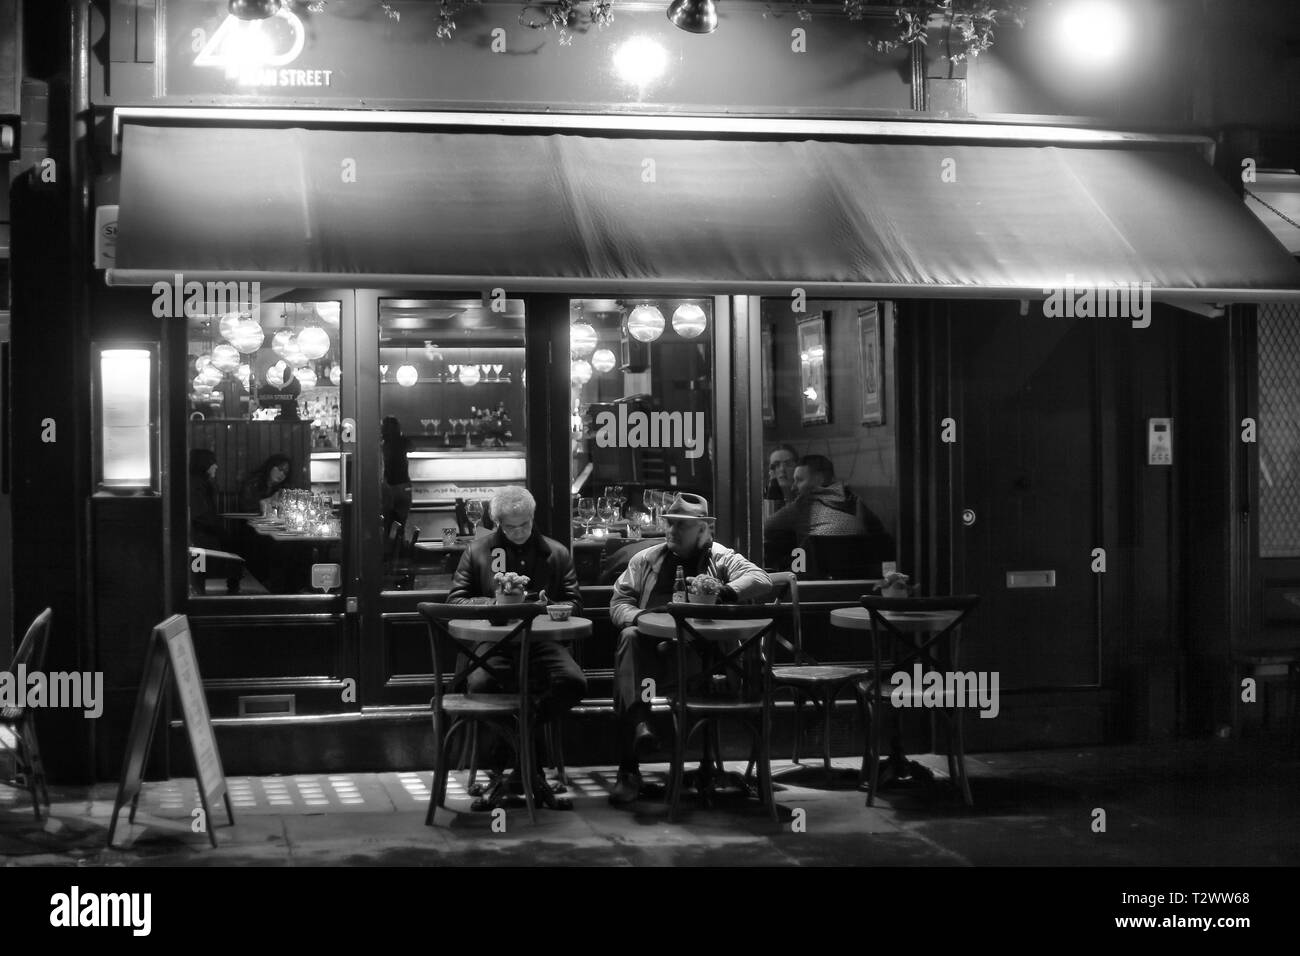 Dean Street coffee shop - Stock Image